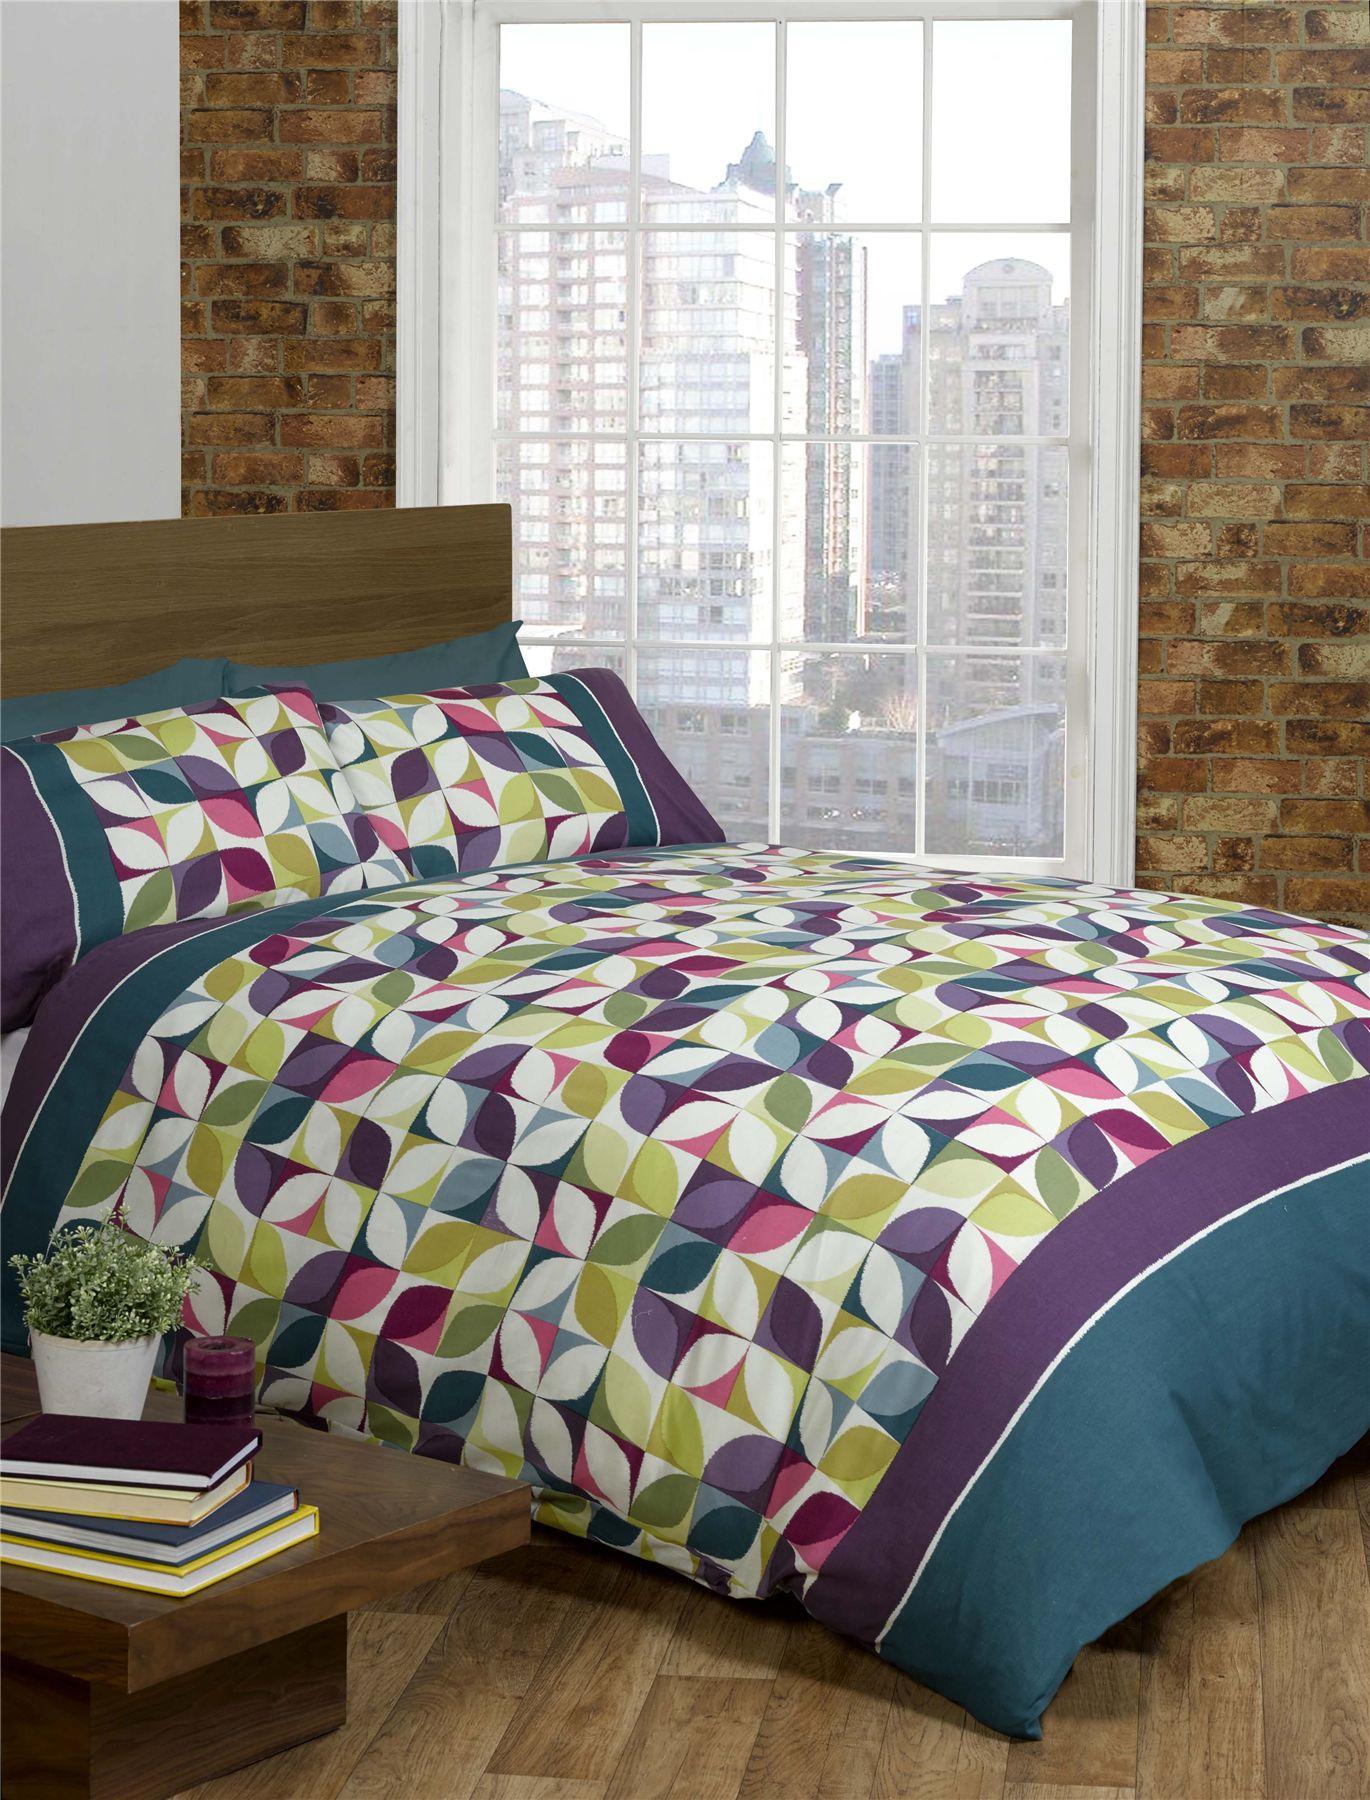 quilt duvet cover amp pillowcase bedding bed set modern  - quiltduvetcoveramppillowcasebeddingbedset